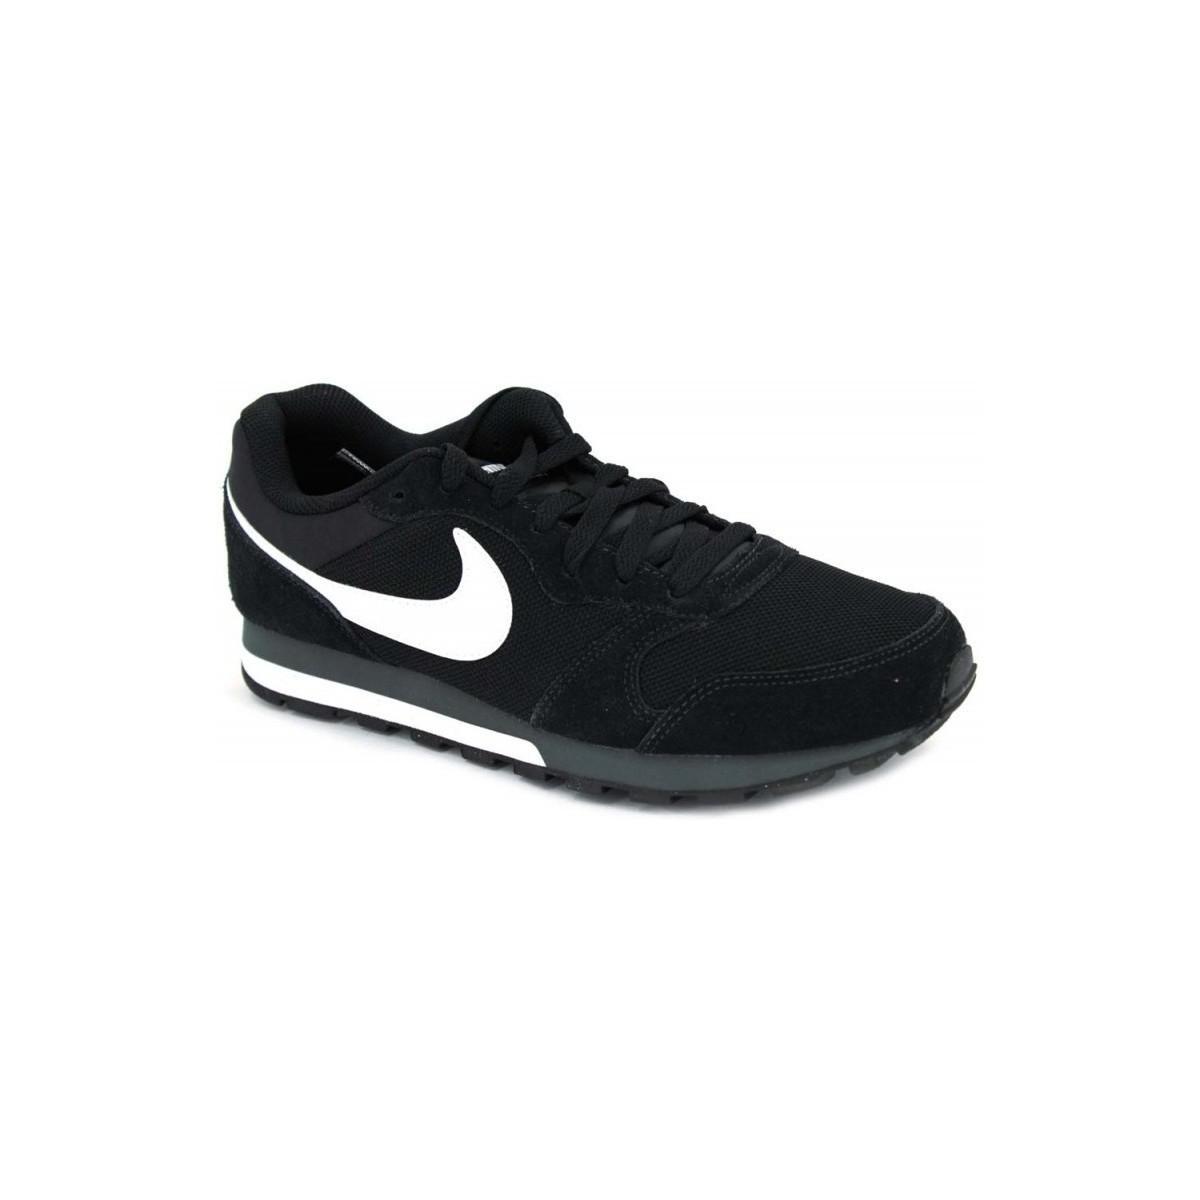 444820198aa3c Nike Md Runner 2 749794 Men s Sneakers Men s Shoes (trainers) In ...